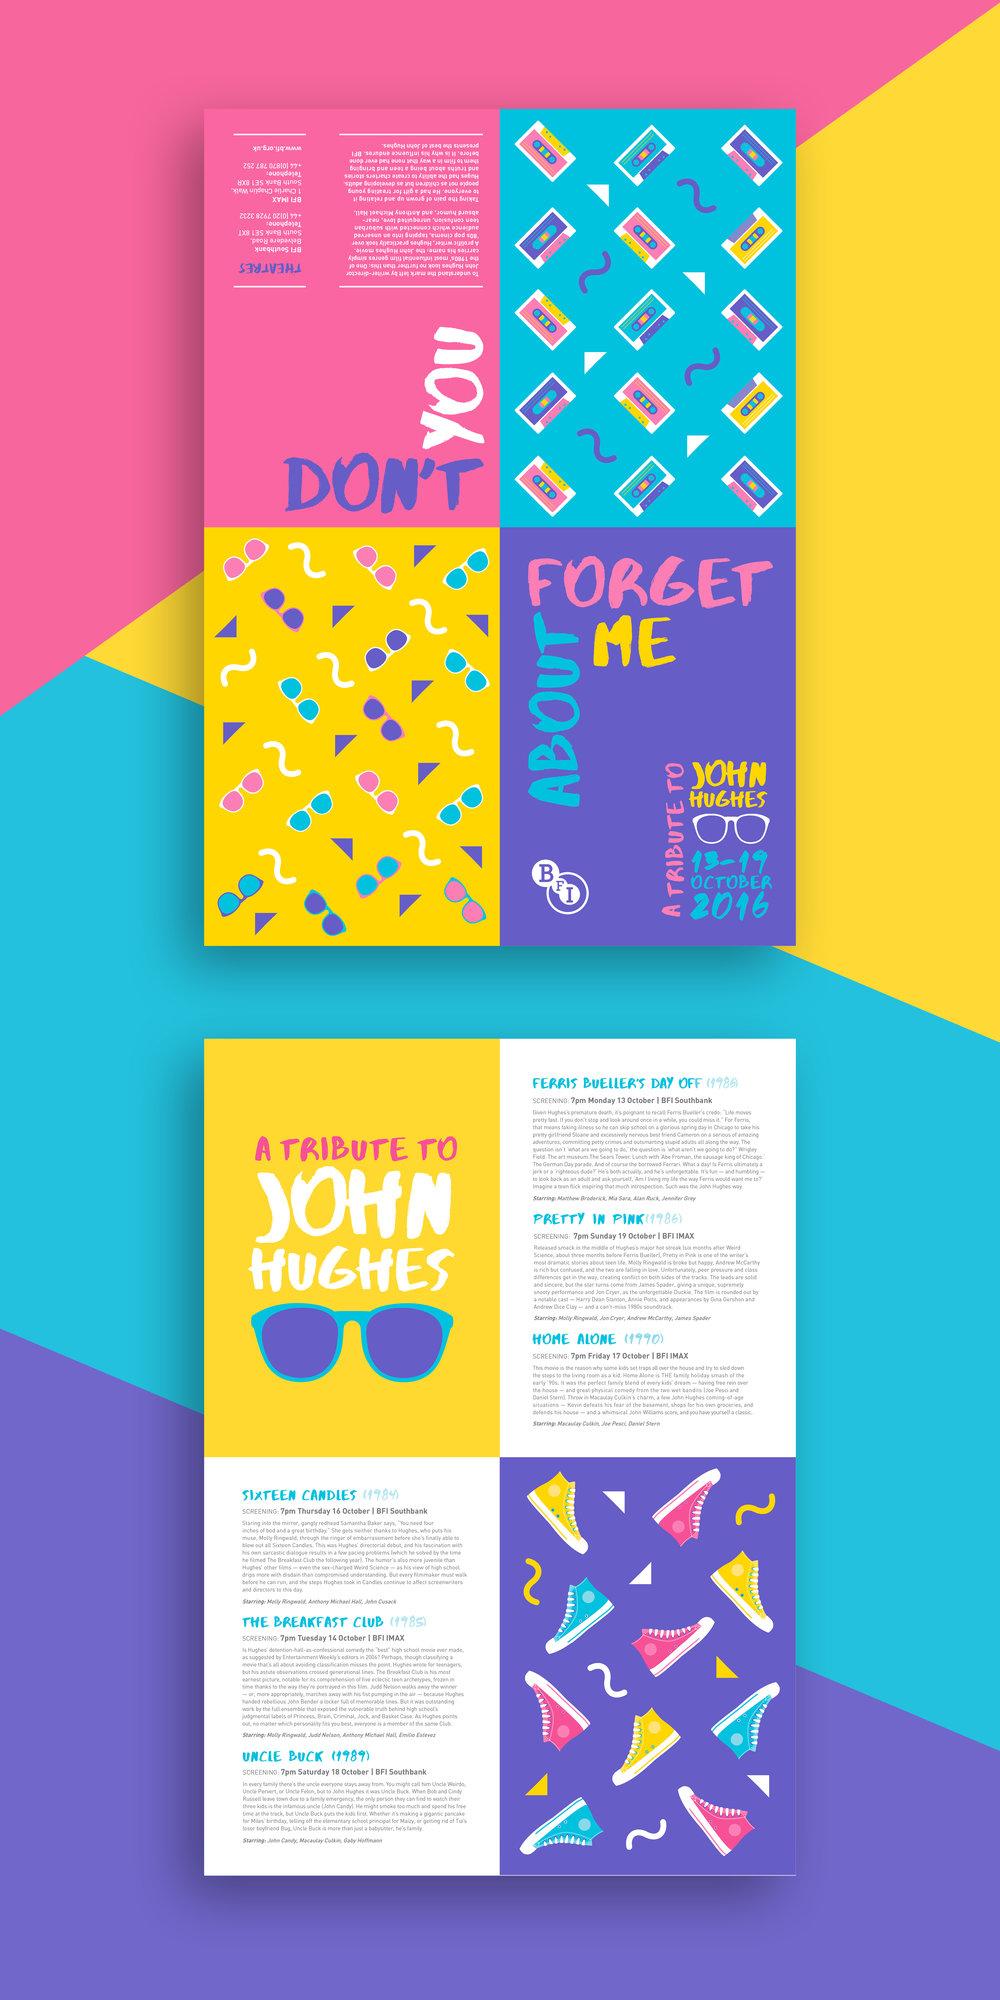 Shanti-Sparrow-john-Hughes-poster-design